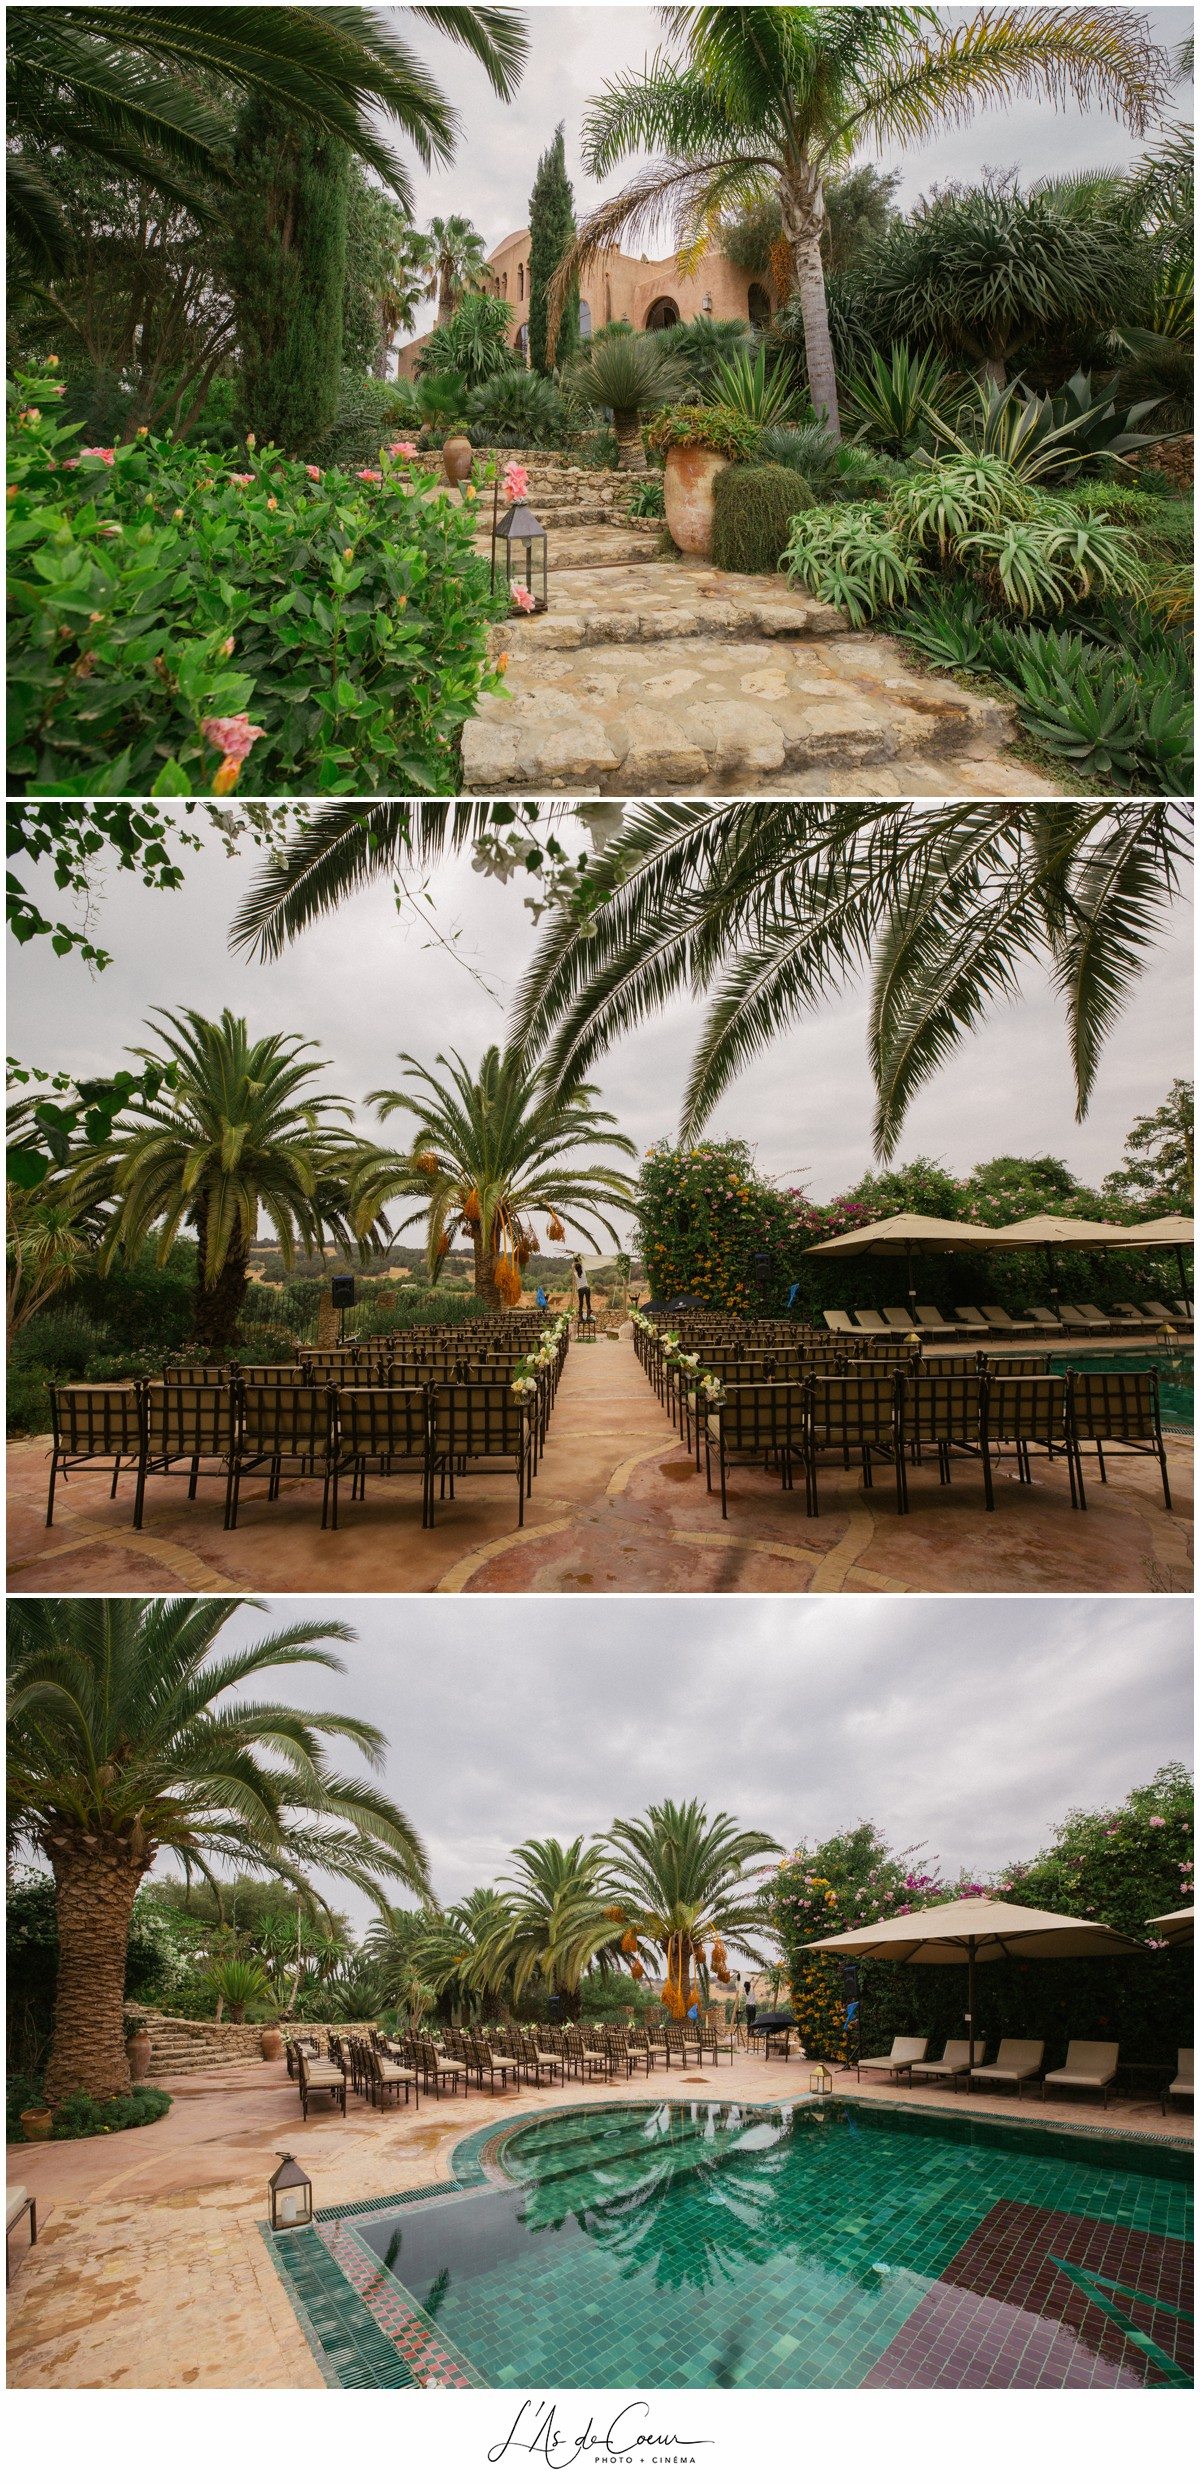 Ceremonie Mariage extérieur Essaouira le Jardin des Douars Maroc ©lasdecoeurphoto